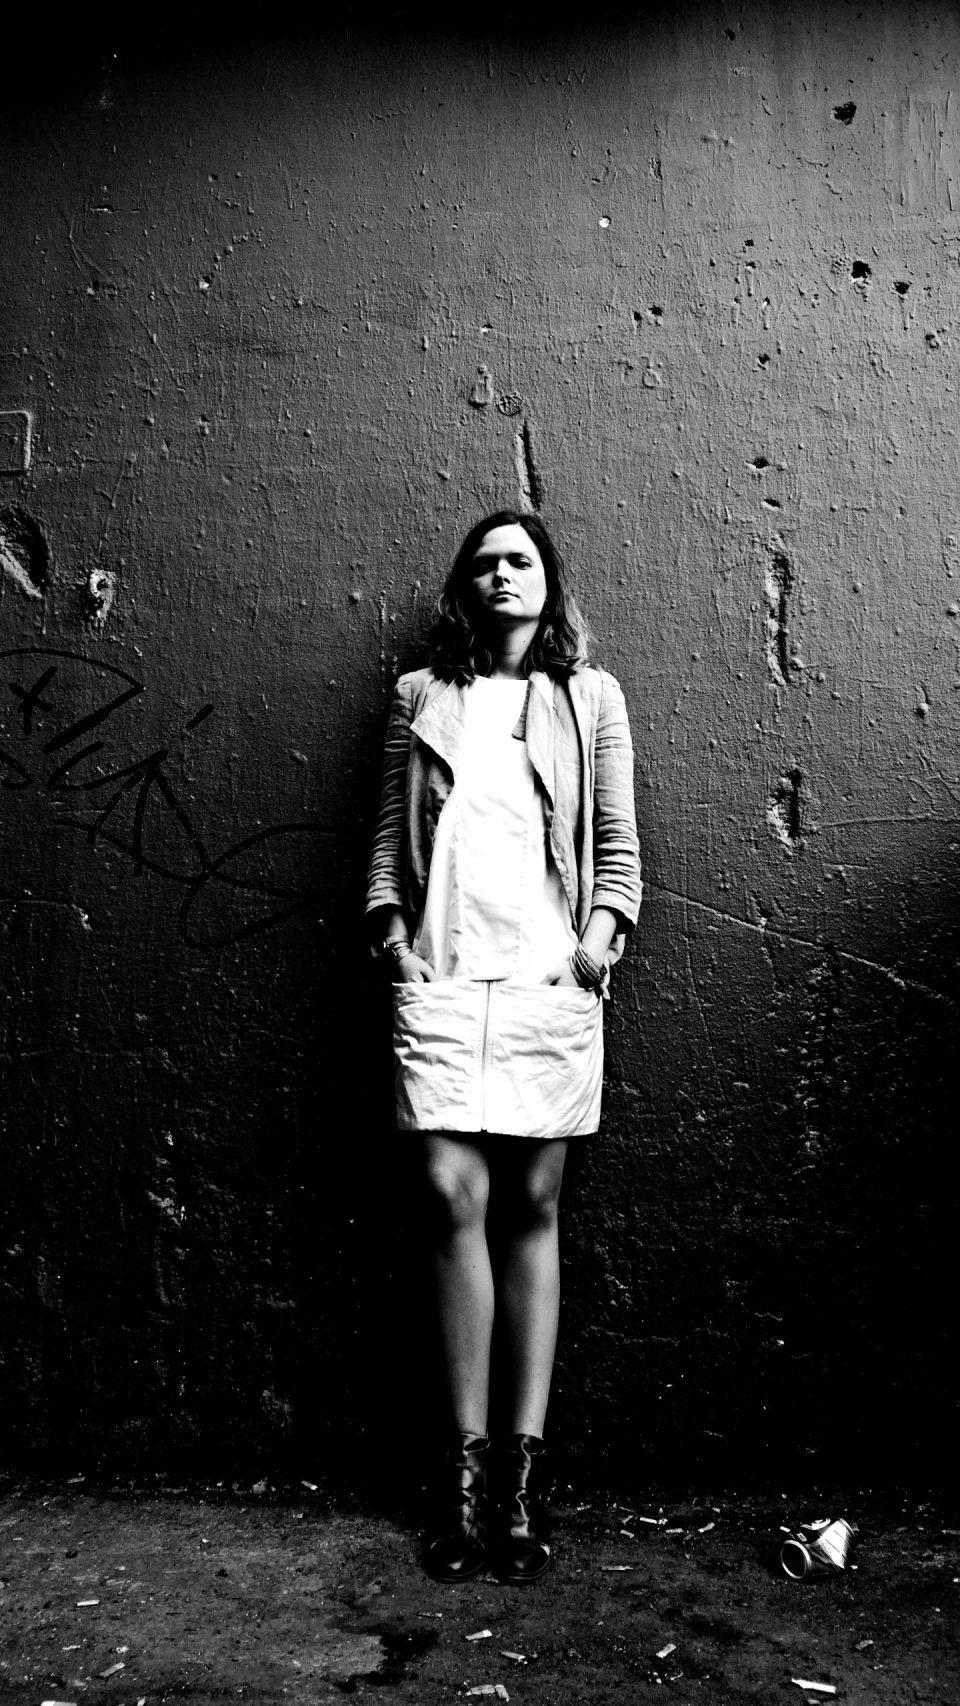 Sabina photographed inside the Leake Street Tunnel